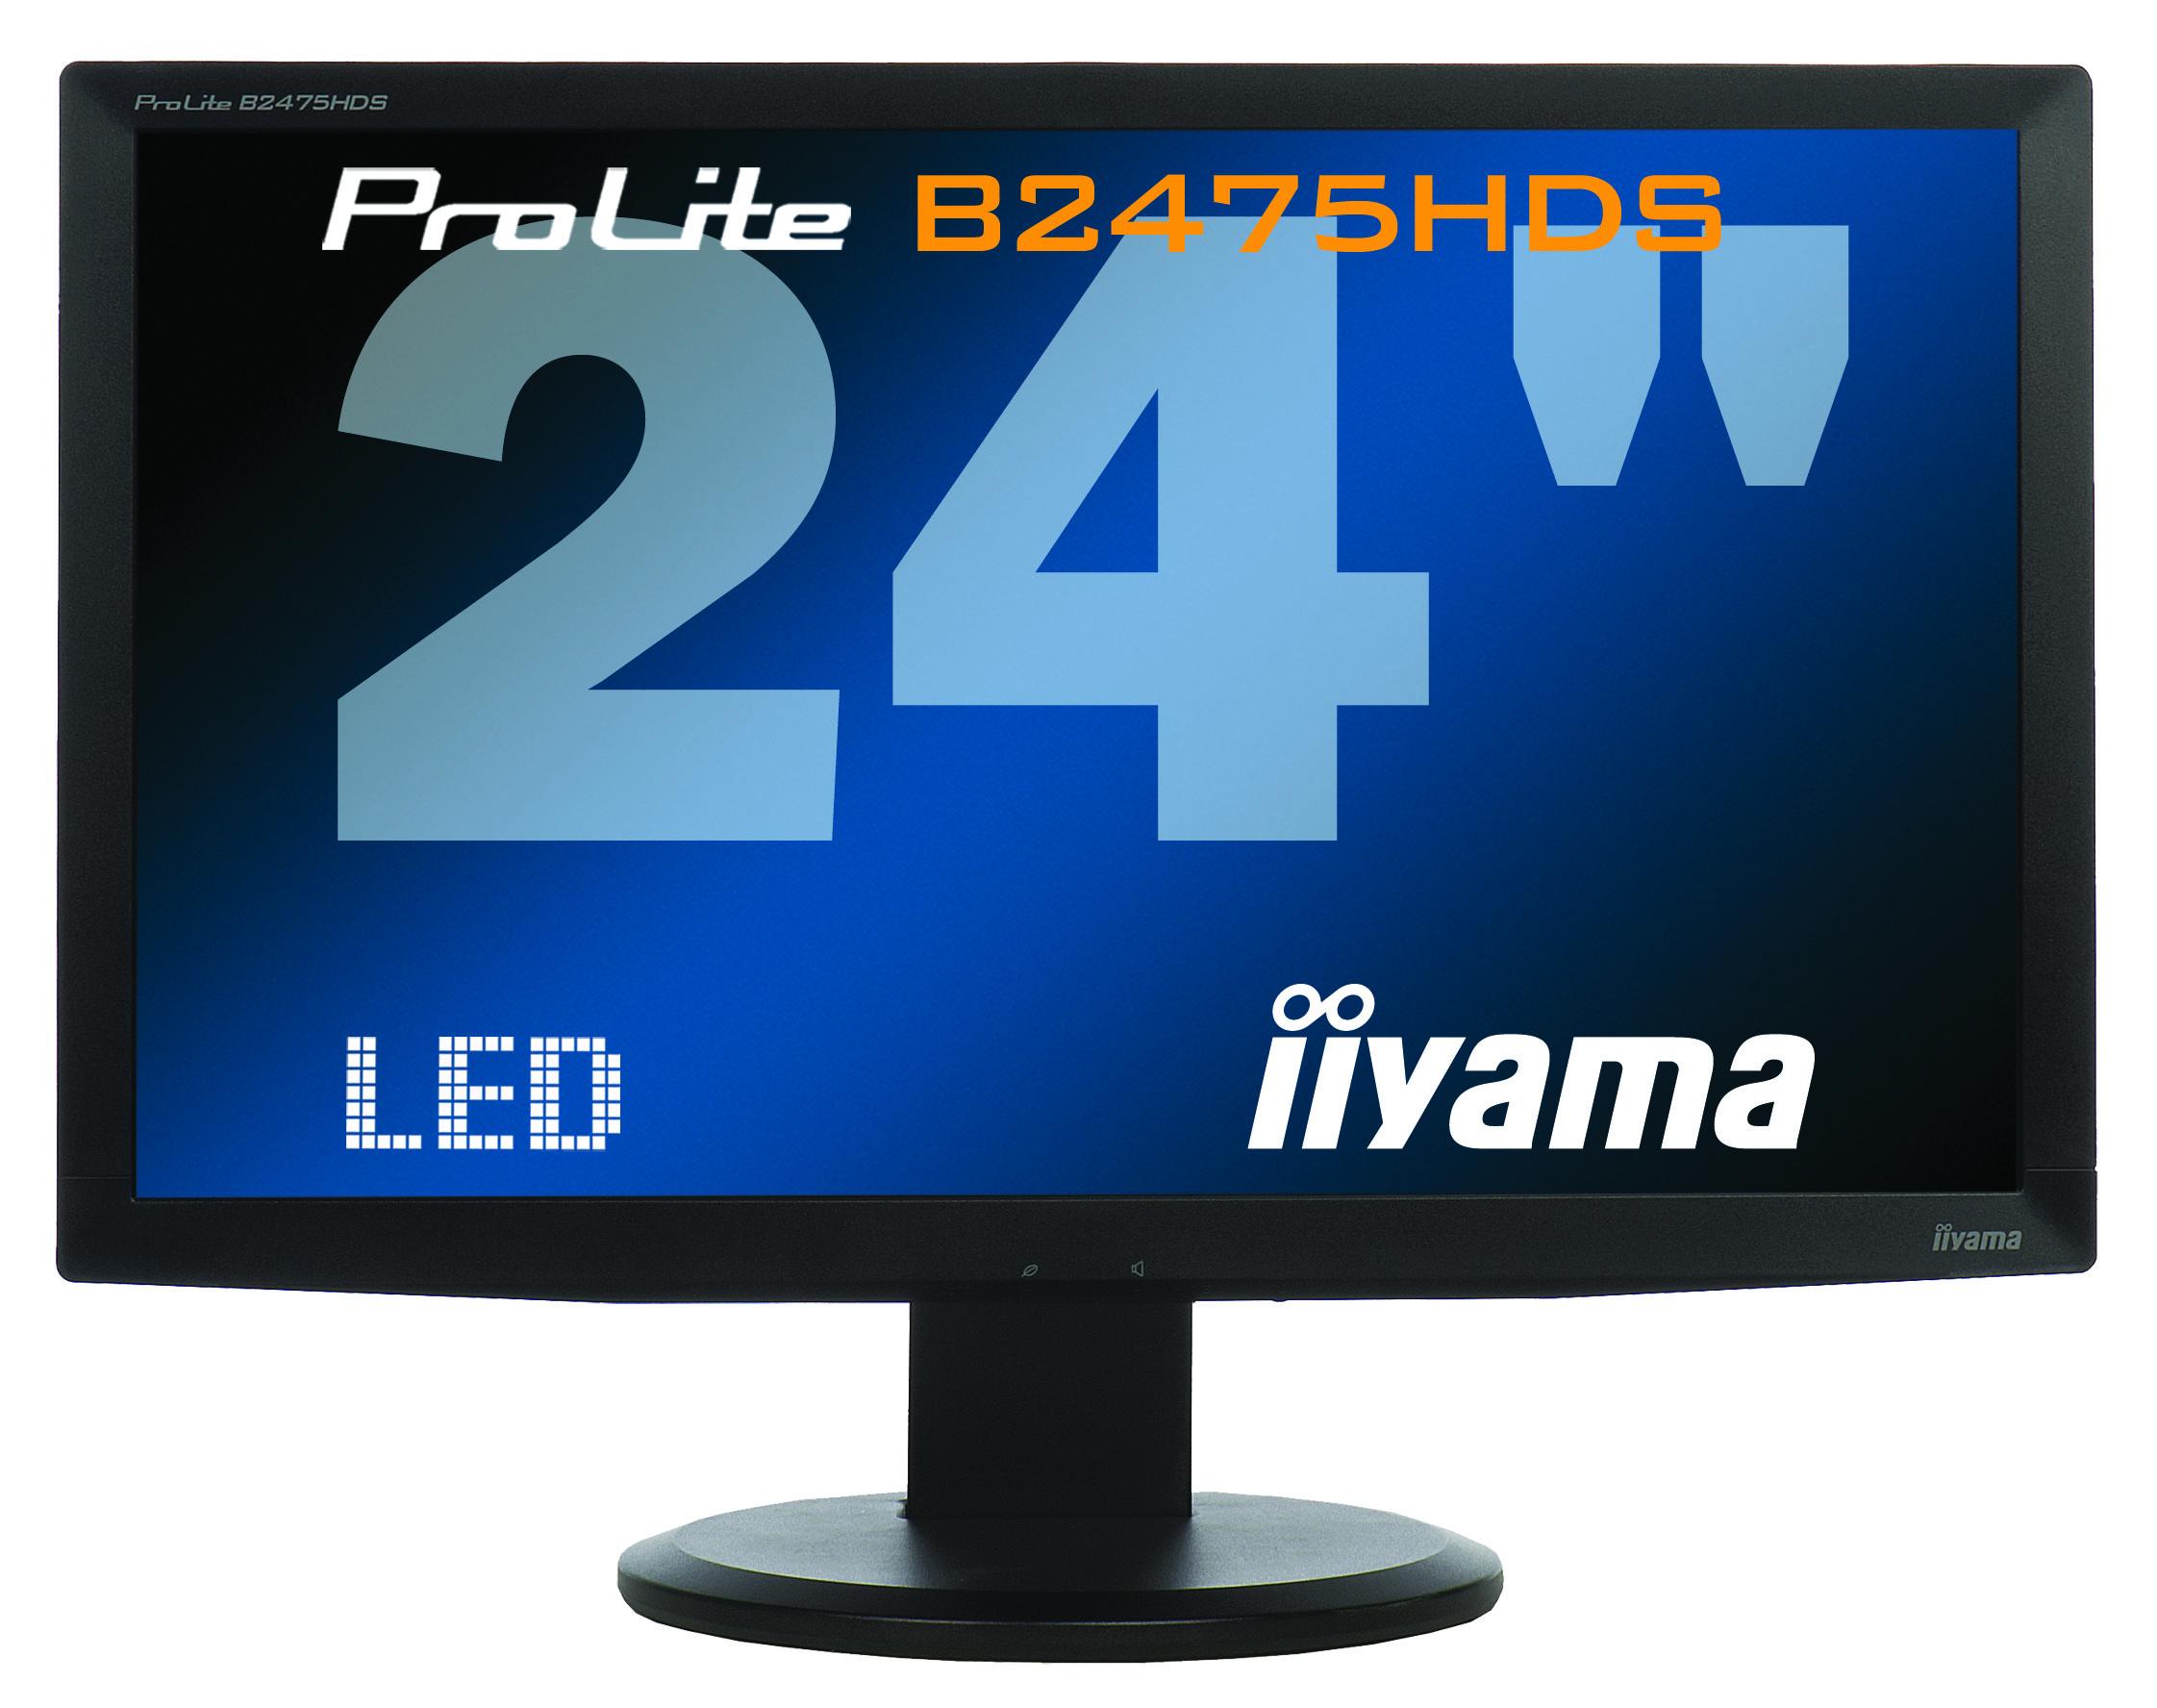 Monitor LED iiYama ProLite B2475HDS, 24 Inch Full HD, VGA, DVI, HDMI